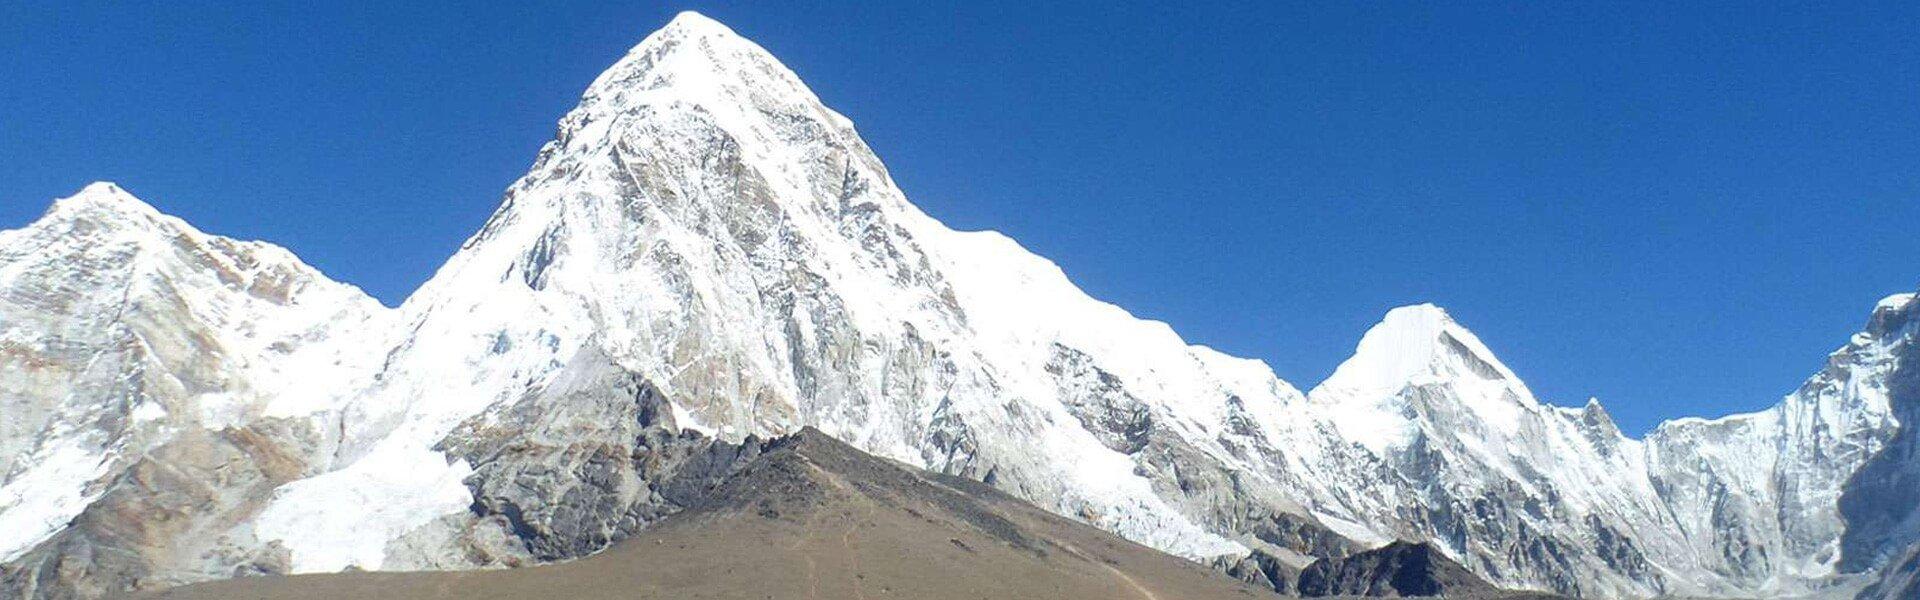 Everest region trek itinerary